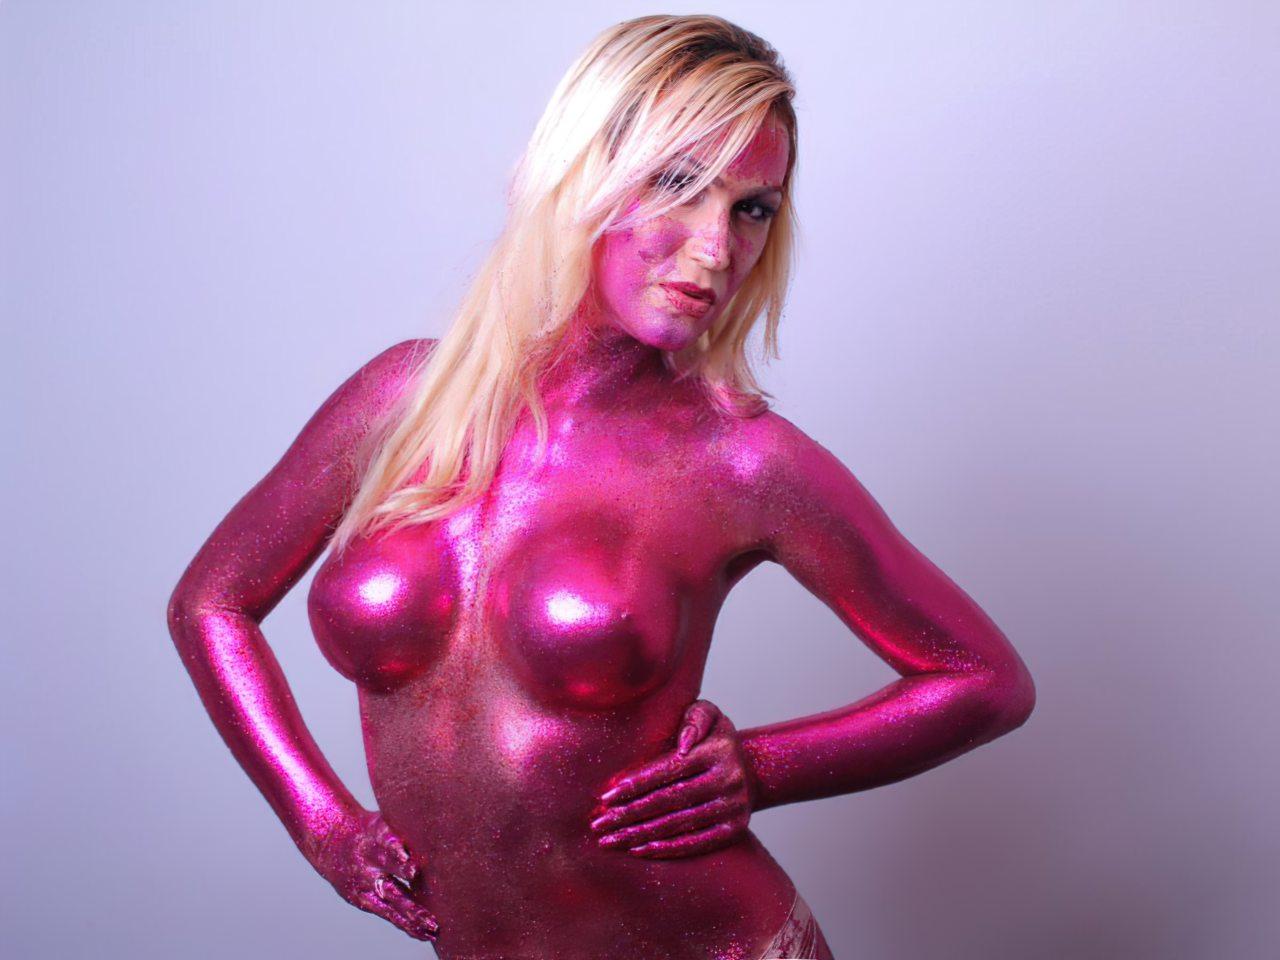 GlossyDiamondX Transex Nicole (58)